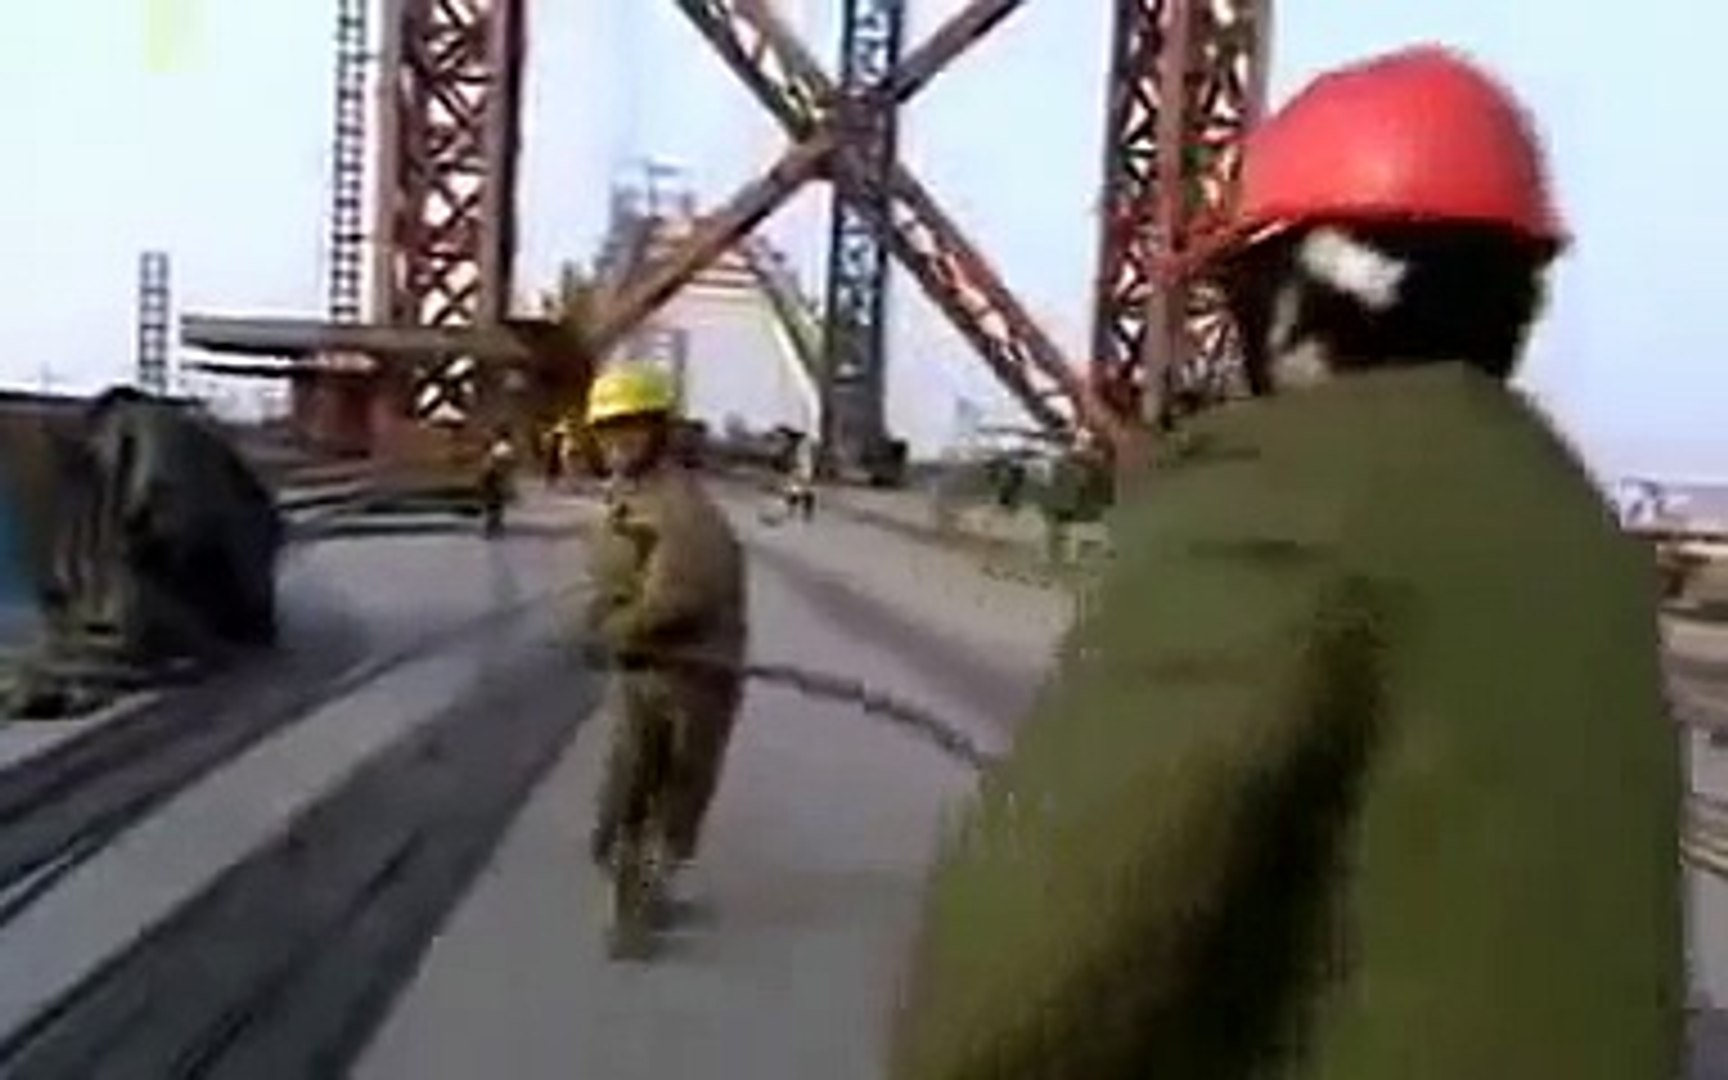 Lupu Arch Bridge China - Megastructures Documentary - National Geographic Documentary